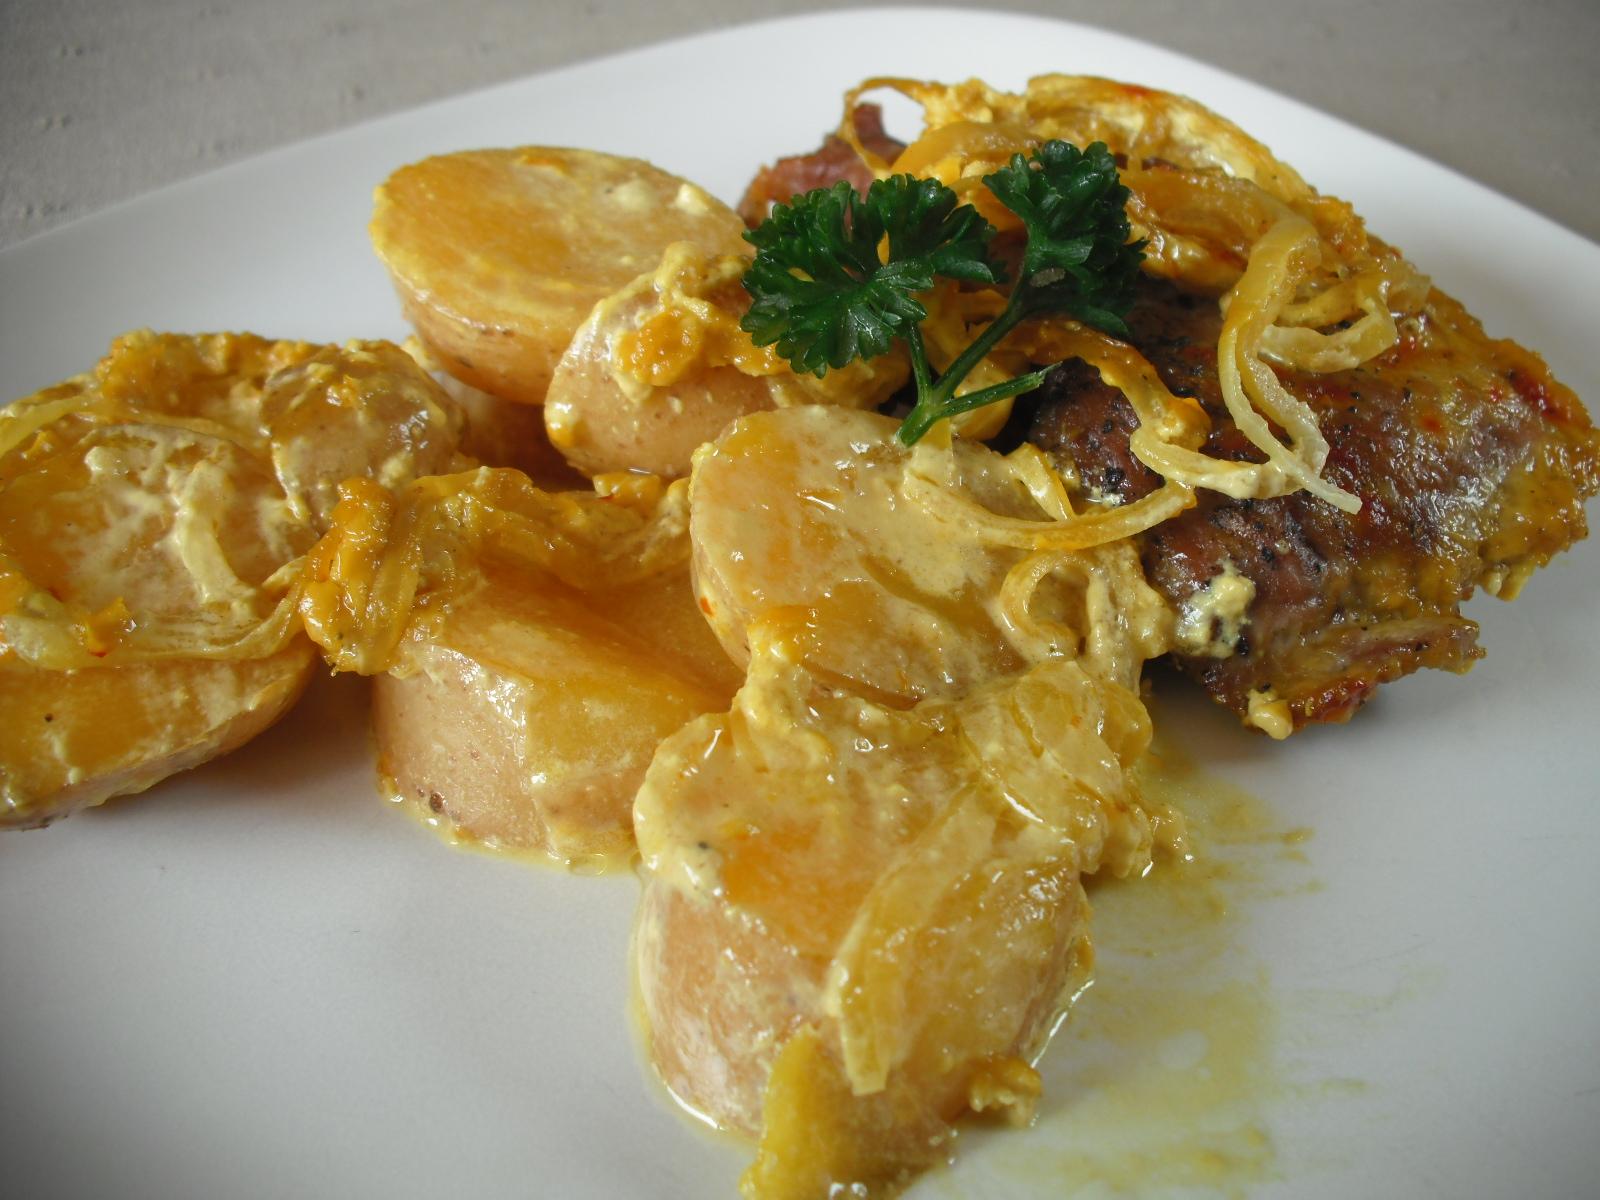 Fotografie receptu: Zapečené kotletky s bramborem v kari omáčce